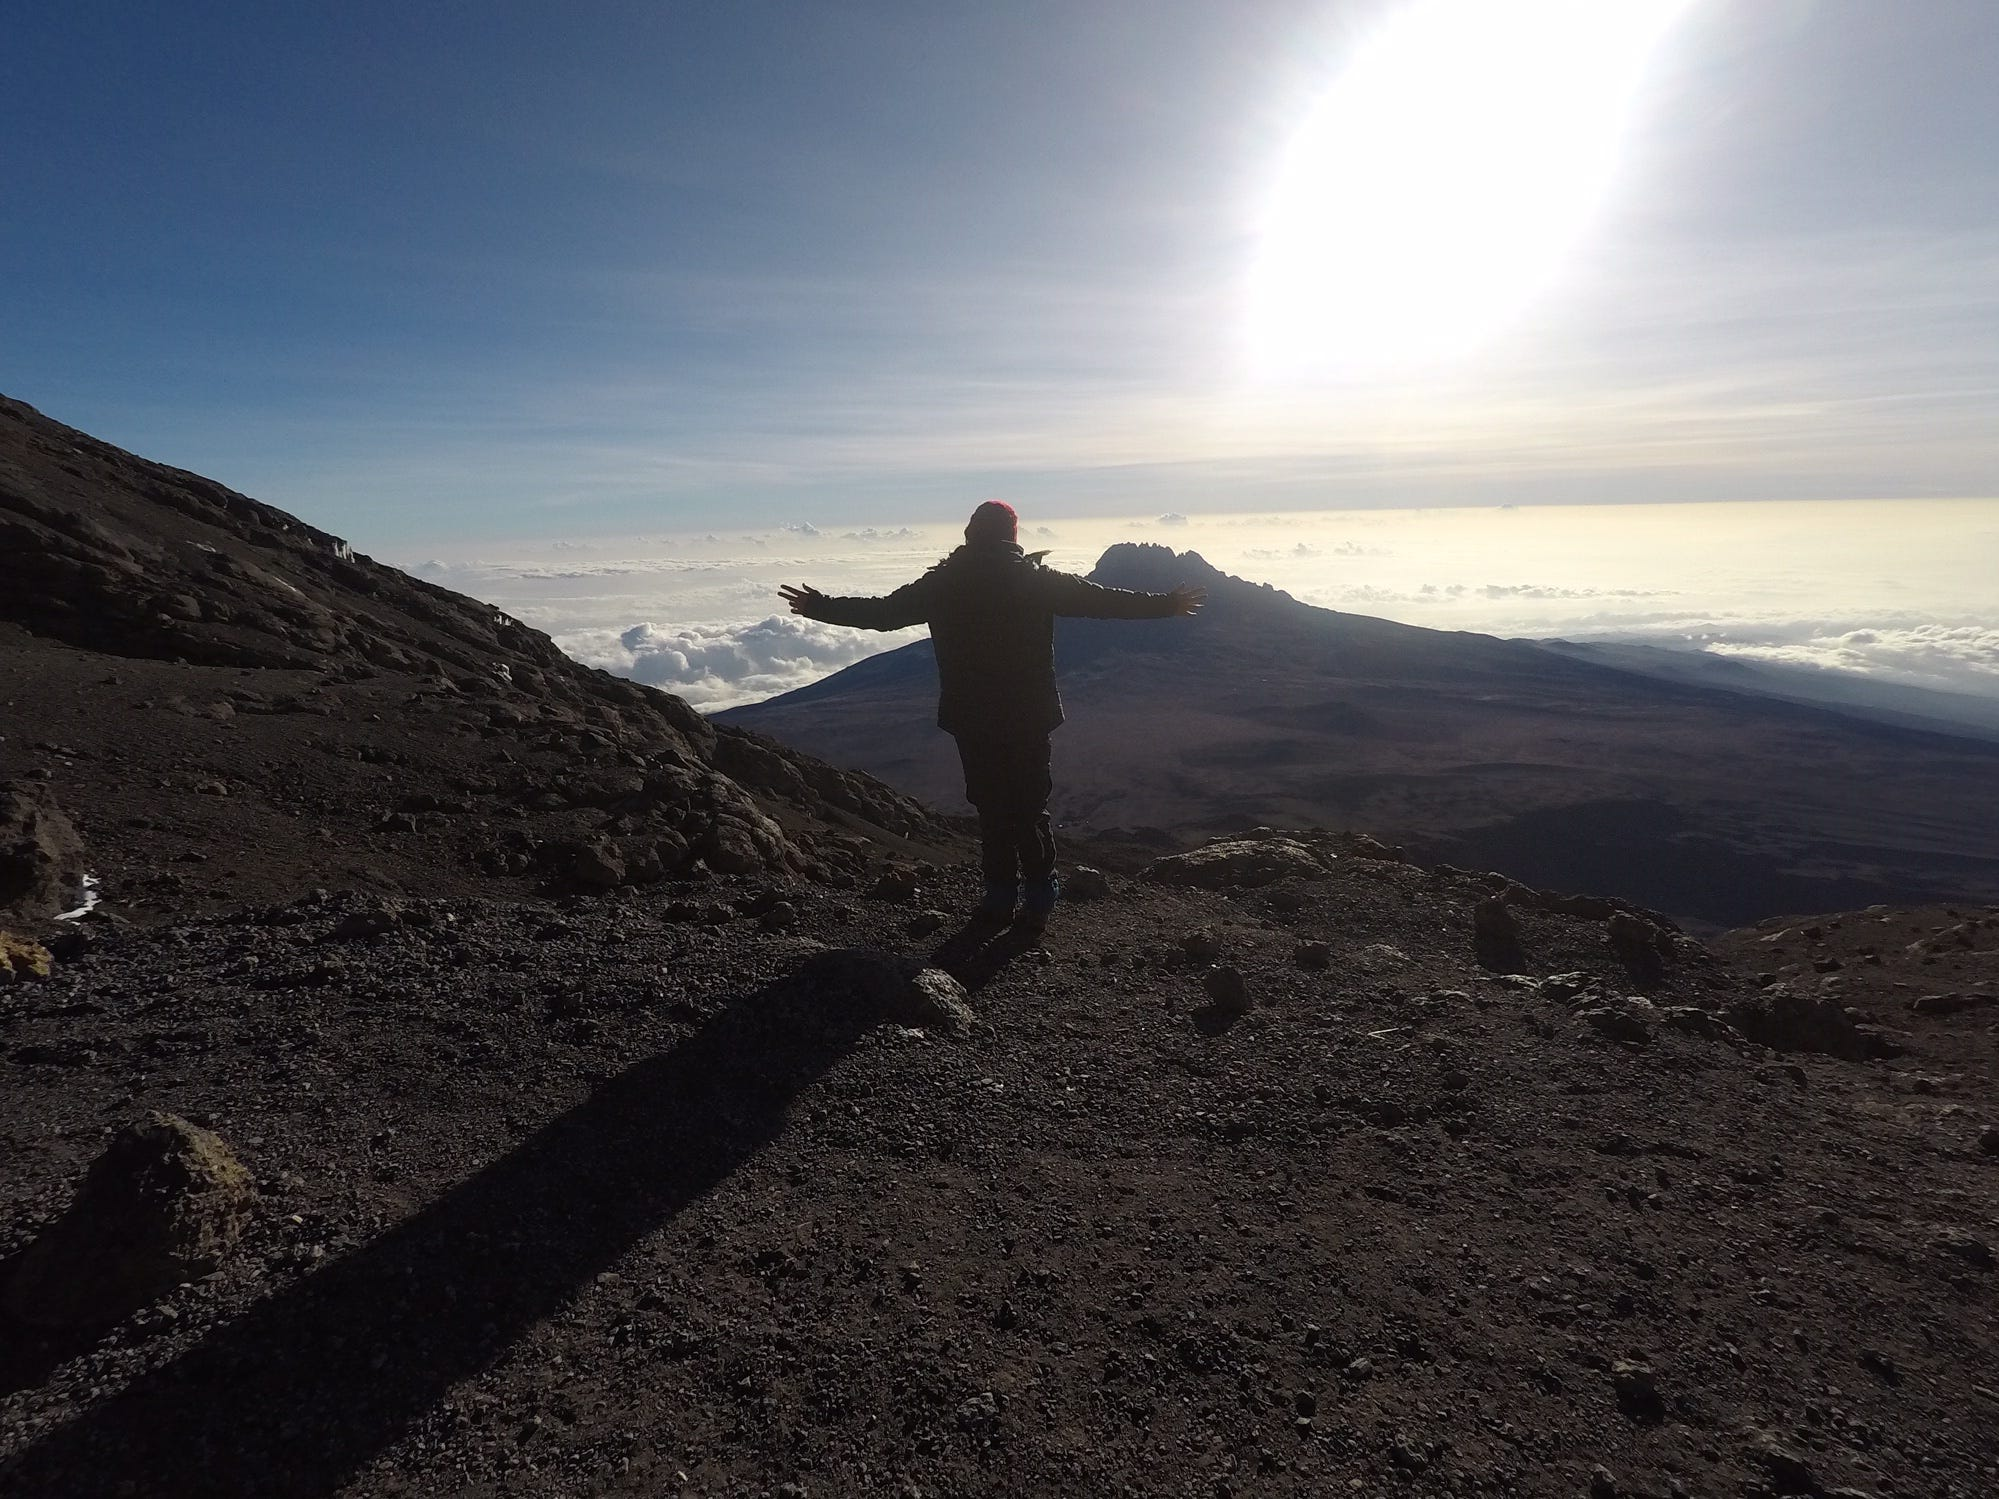 A moment of peace at the summit of Mount Kilimanjaro, Tanzania